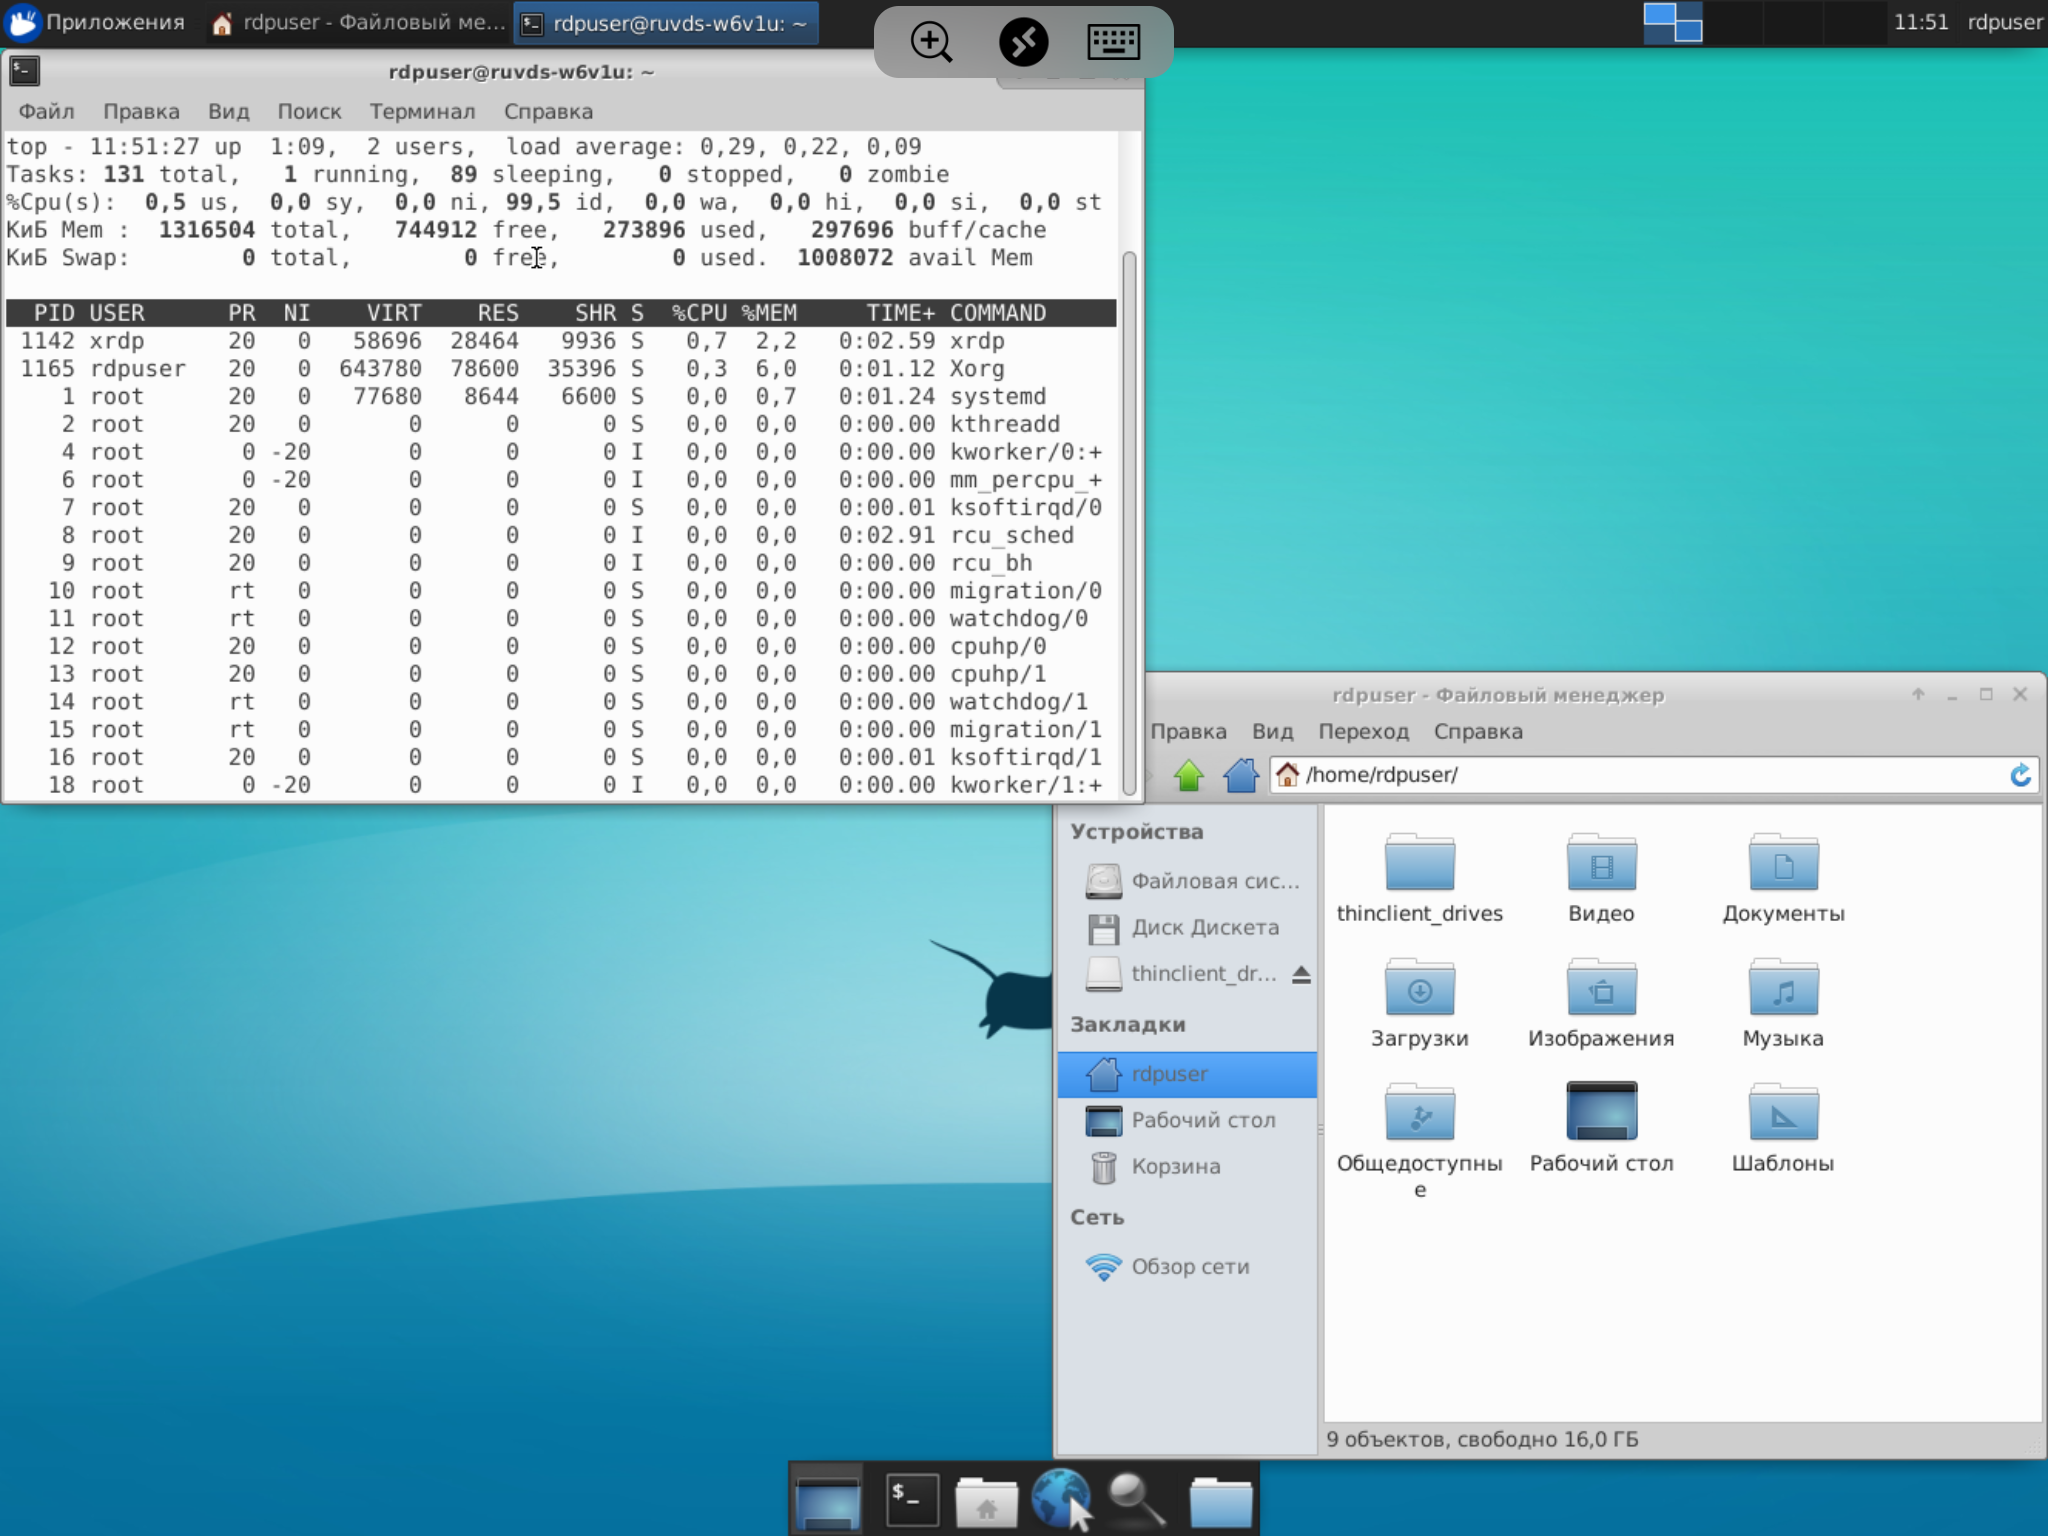 VPS на Linux с графическим интерфейсом: запускаем сервер RDP на Ubuntu 18.04 - 6